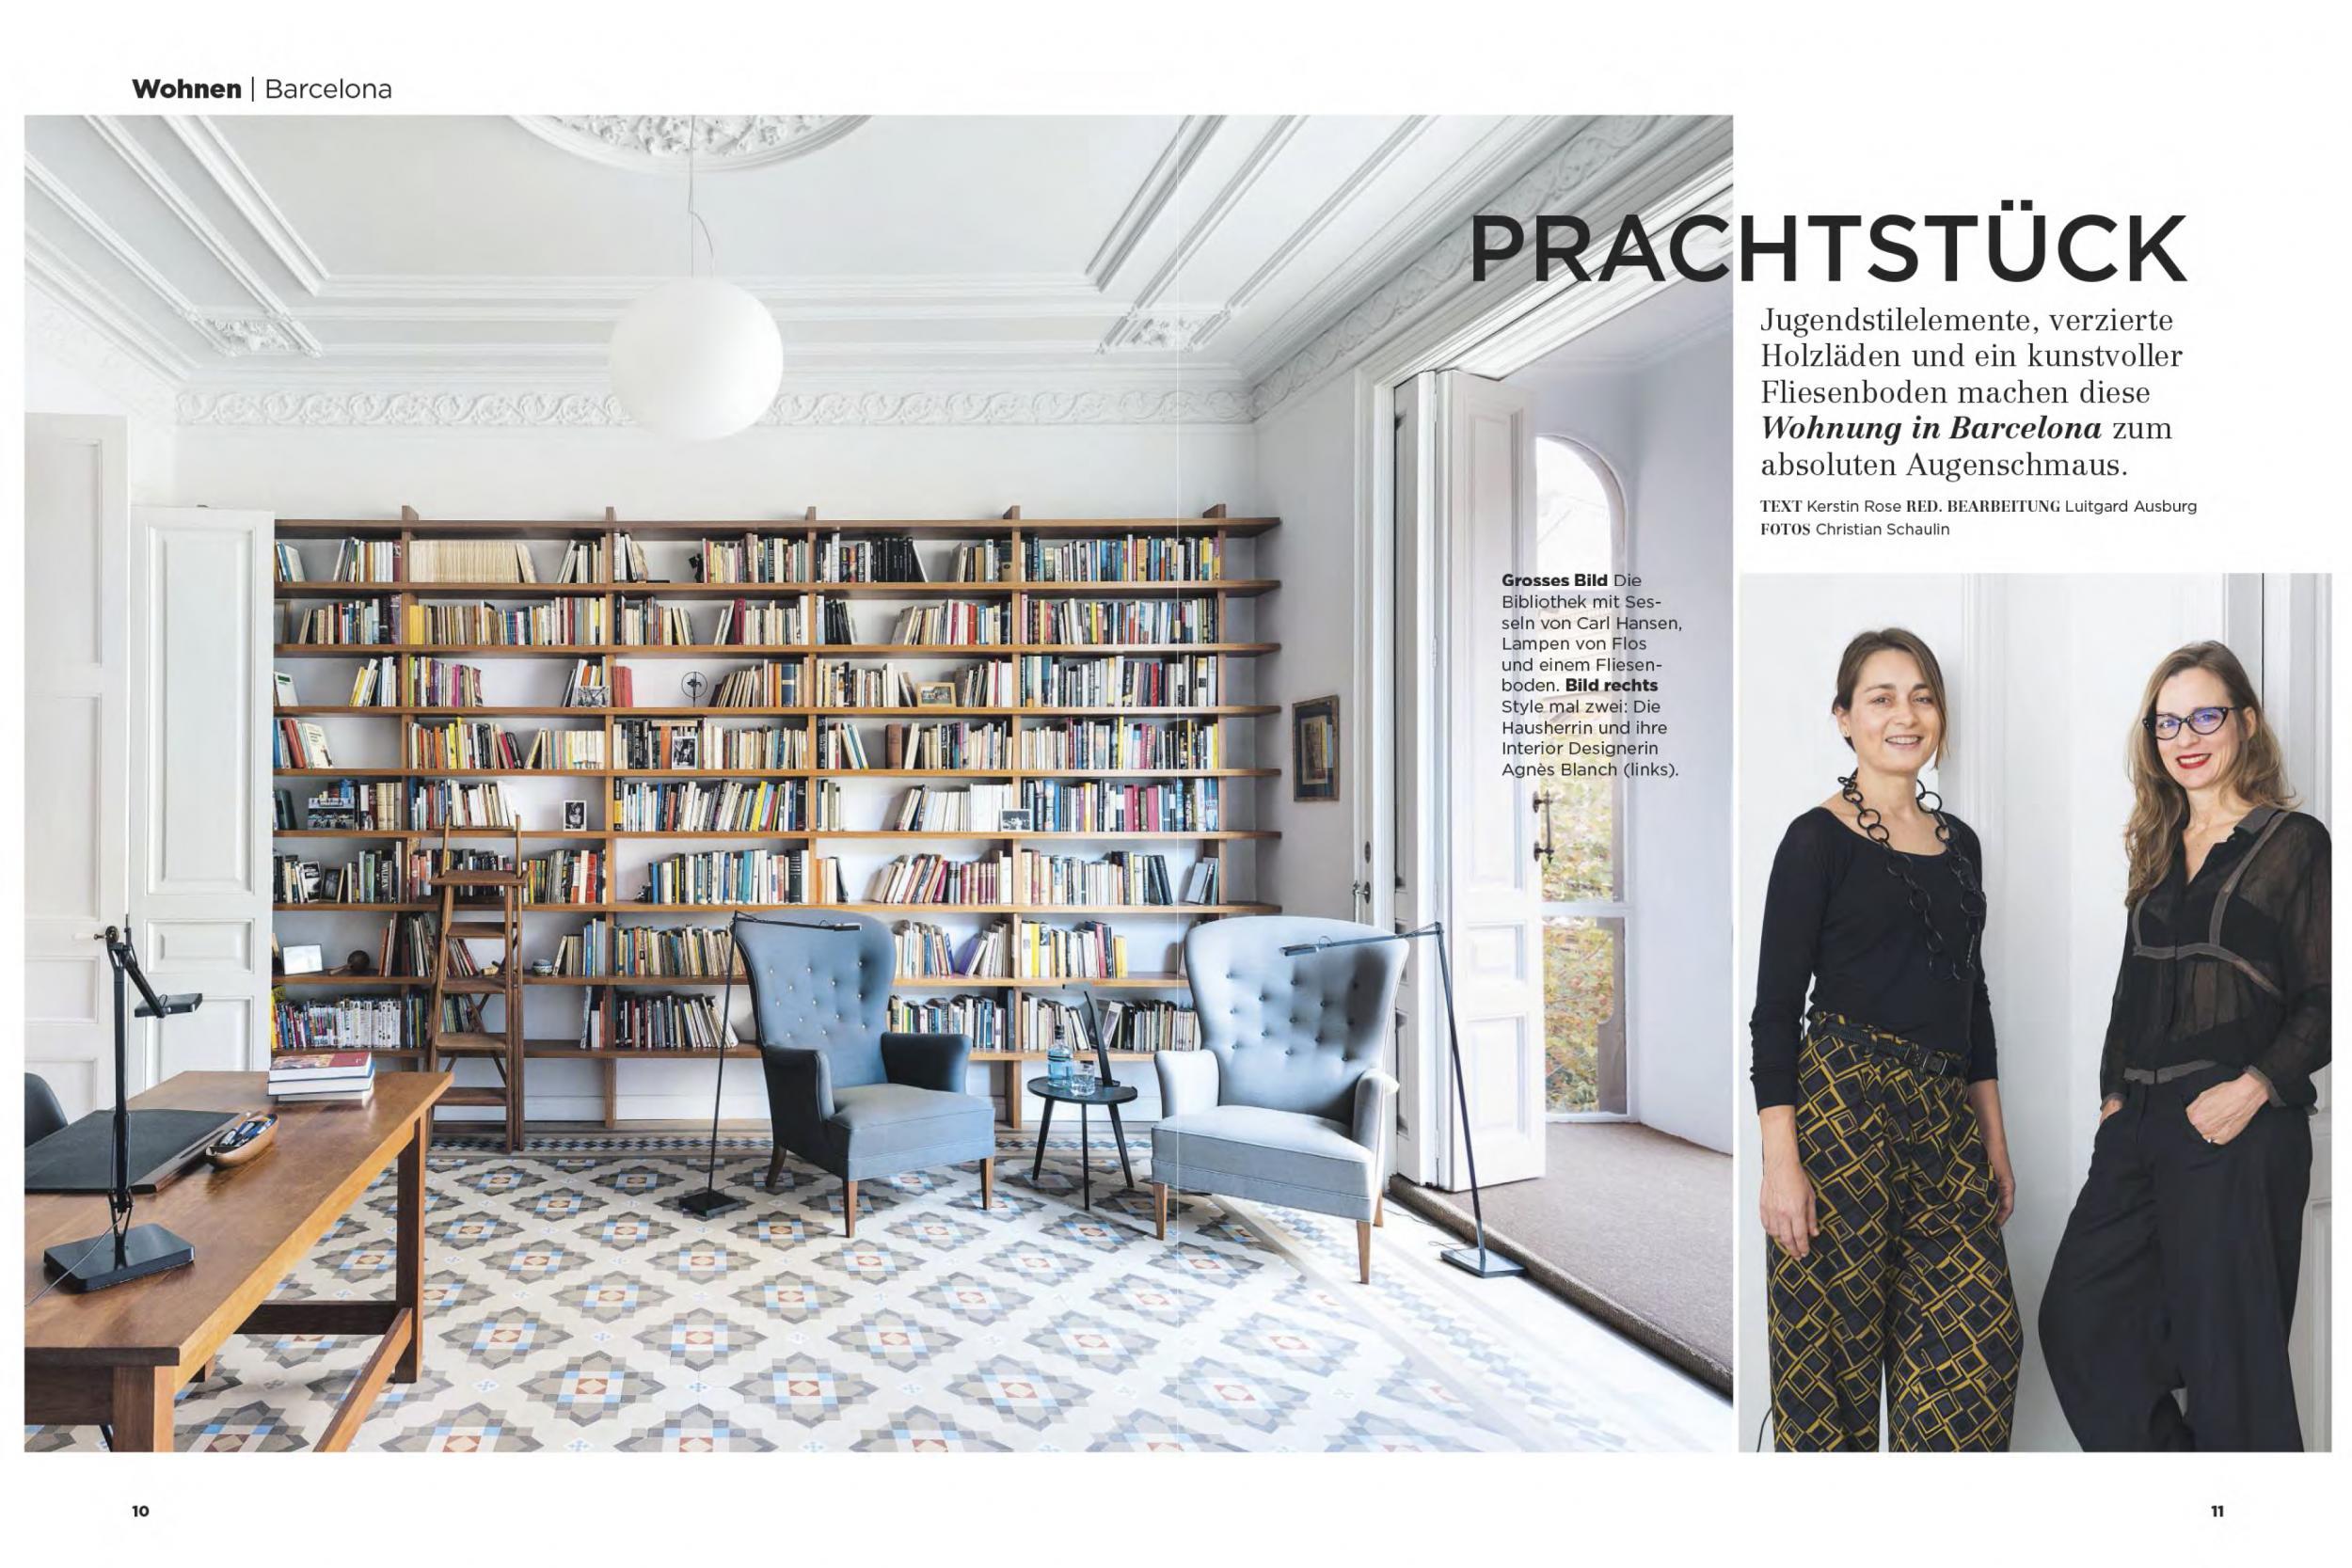 Modern wohnen octubre 2017 vilablanch estudio de for Arquitectura interior